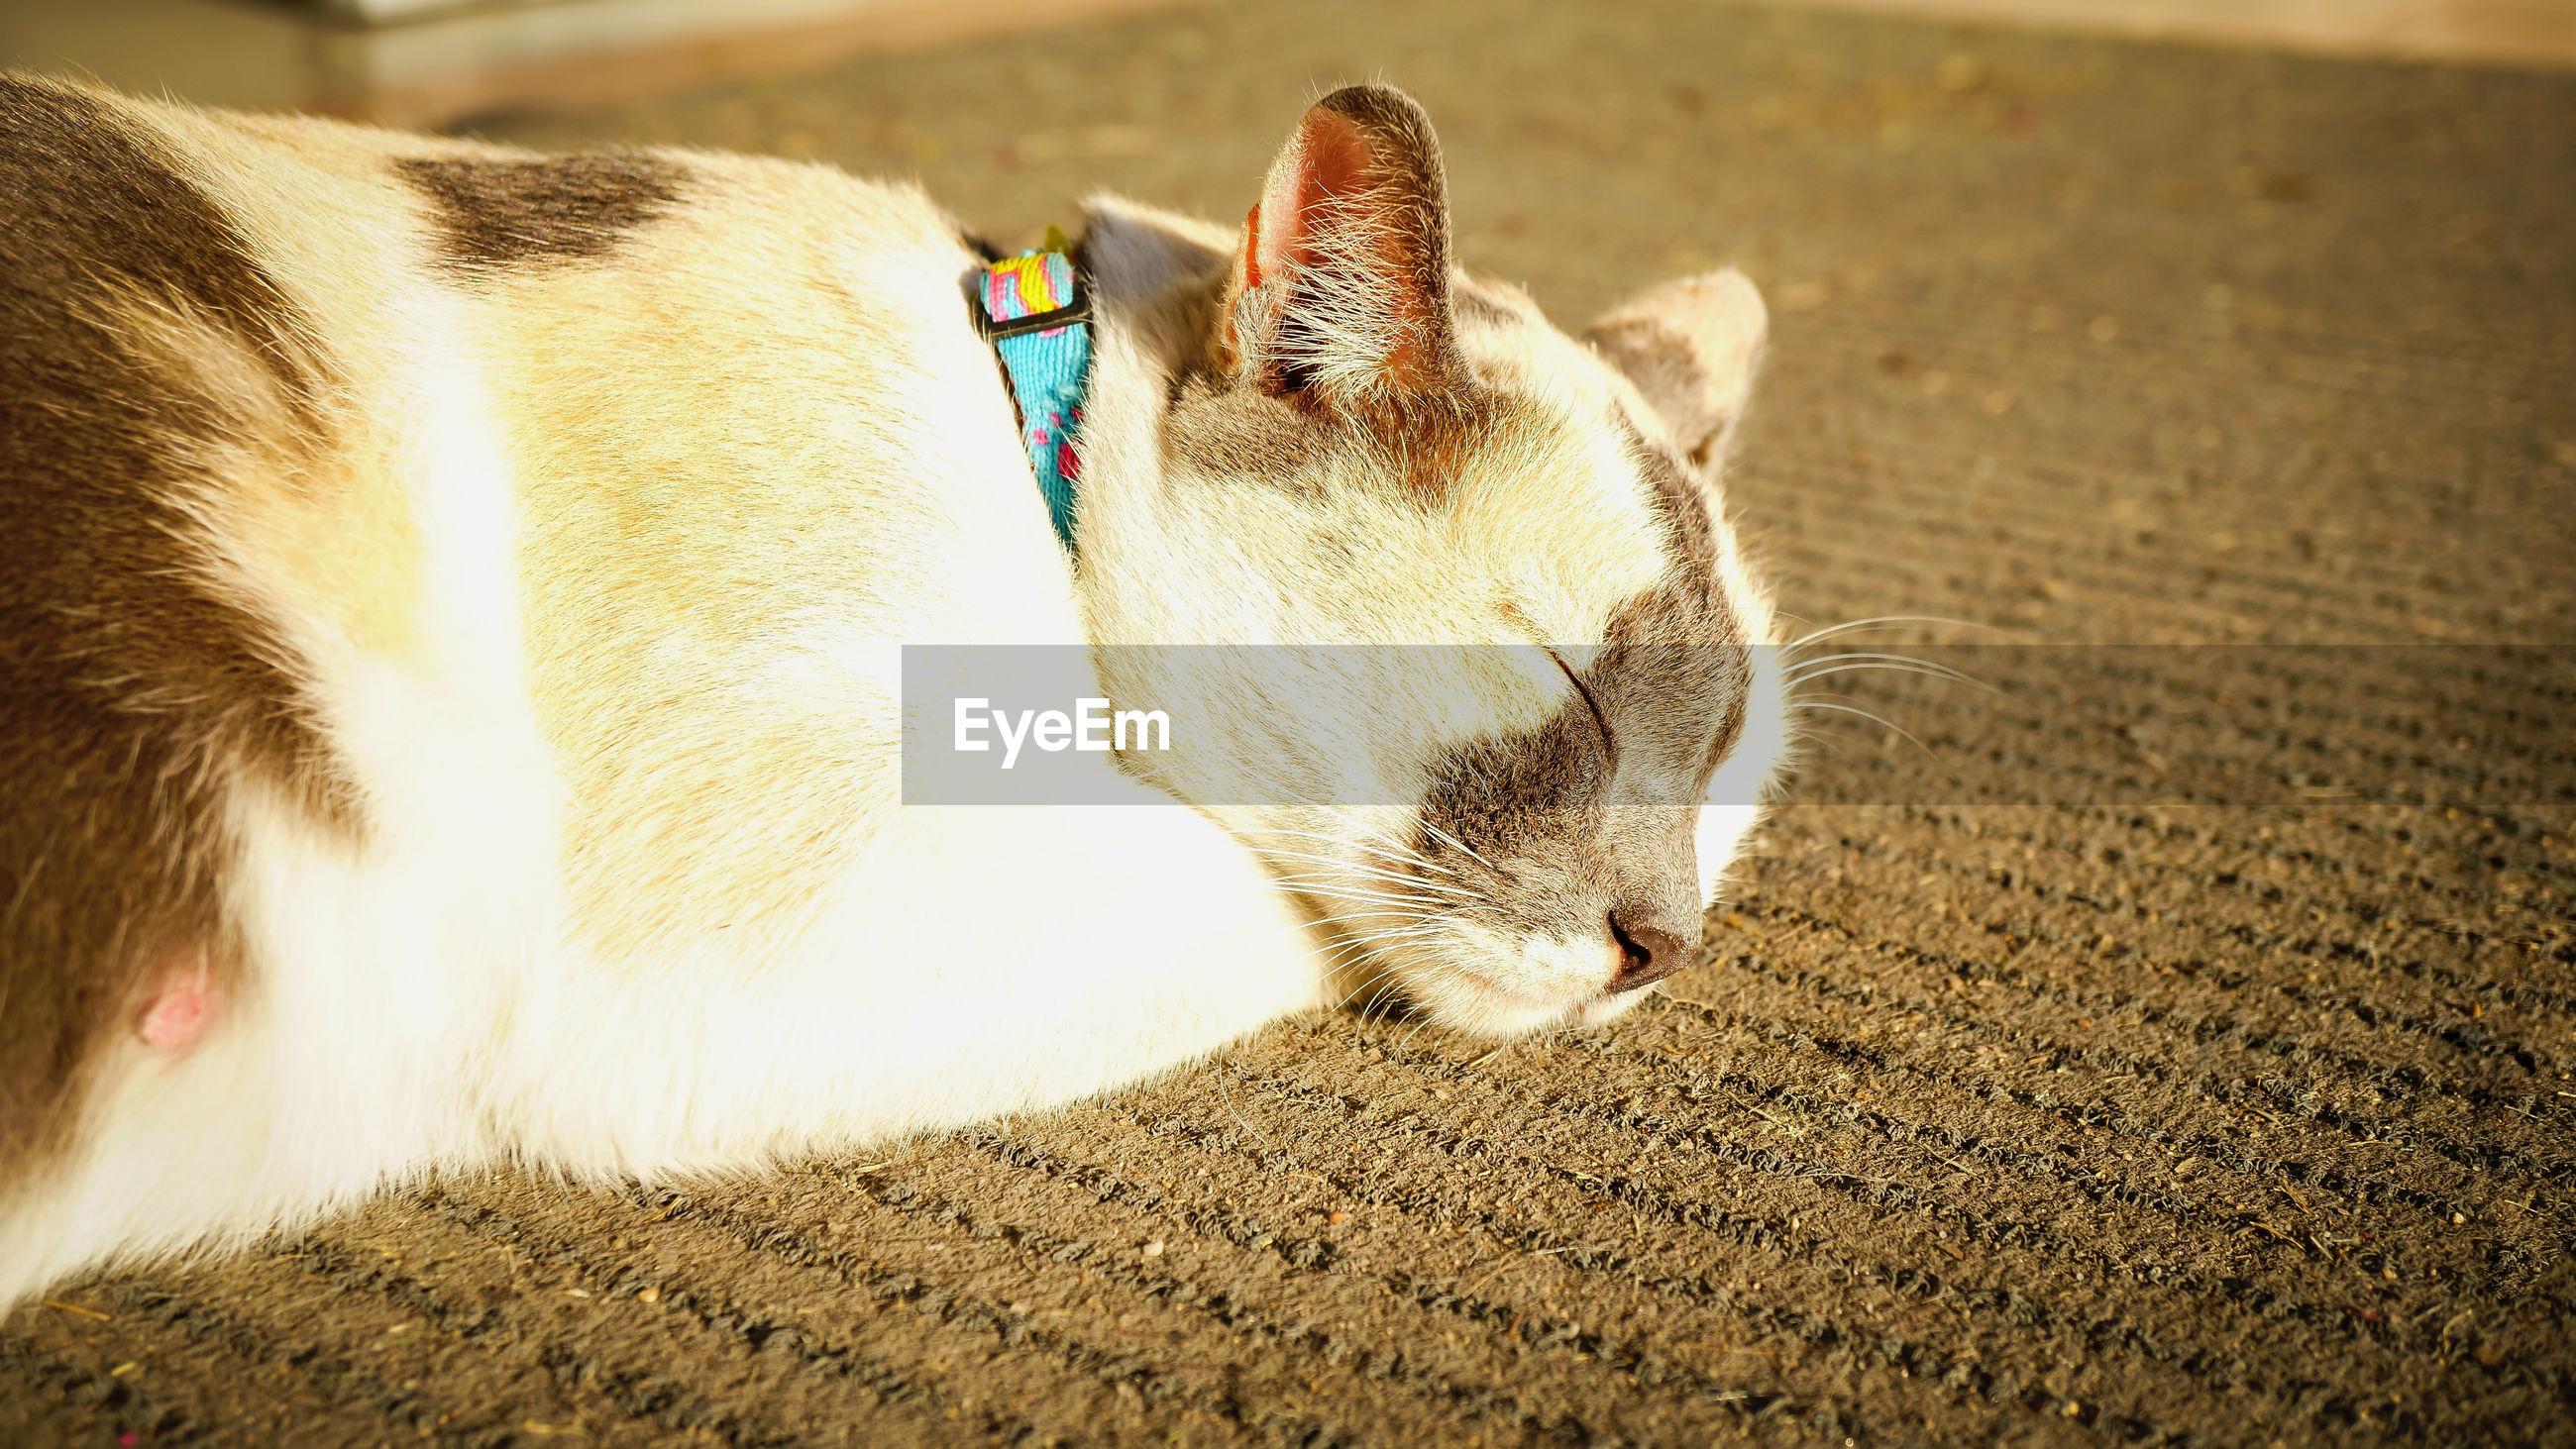 Close-up of cat sleeping on carpet